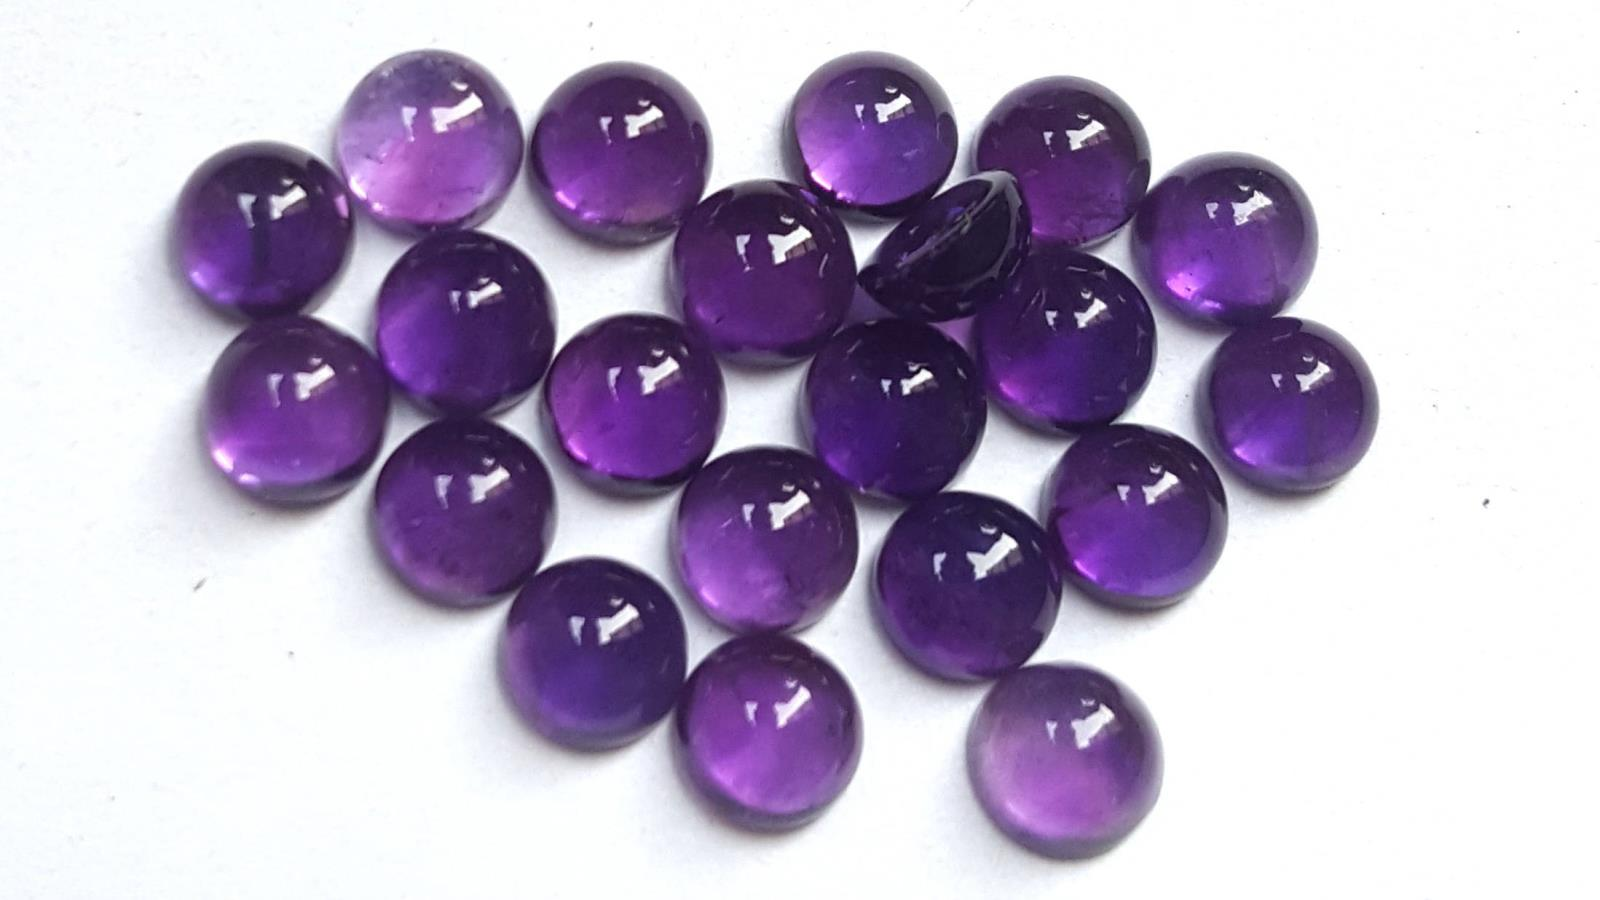 Harga batu kecubung ungu kalimantan asli